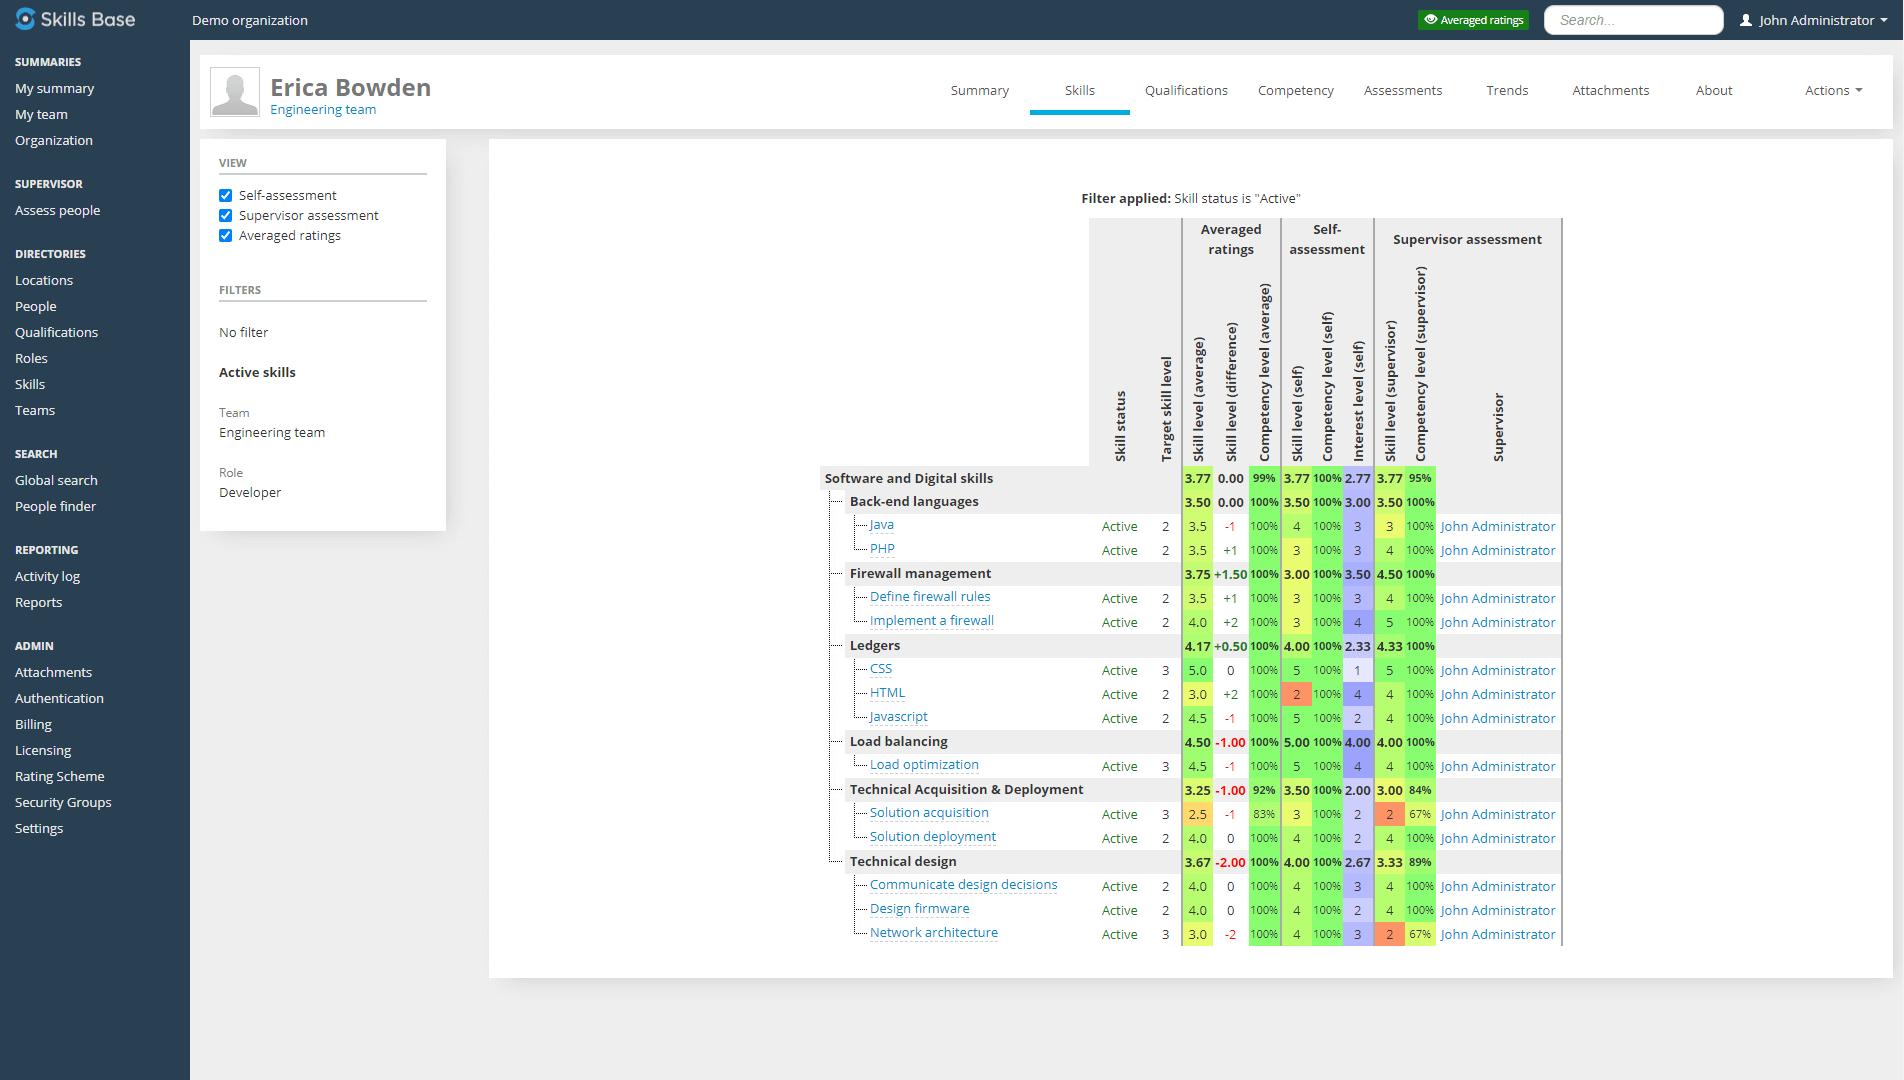 Interactive Skills Matrix